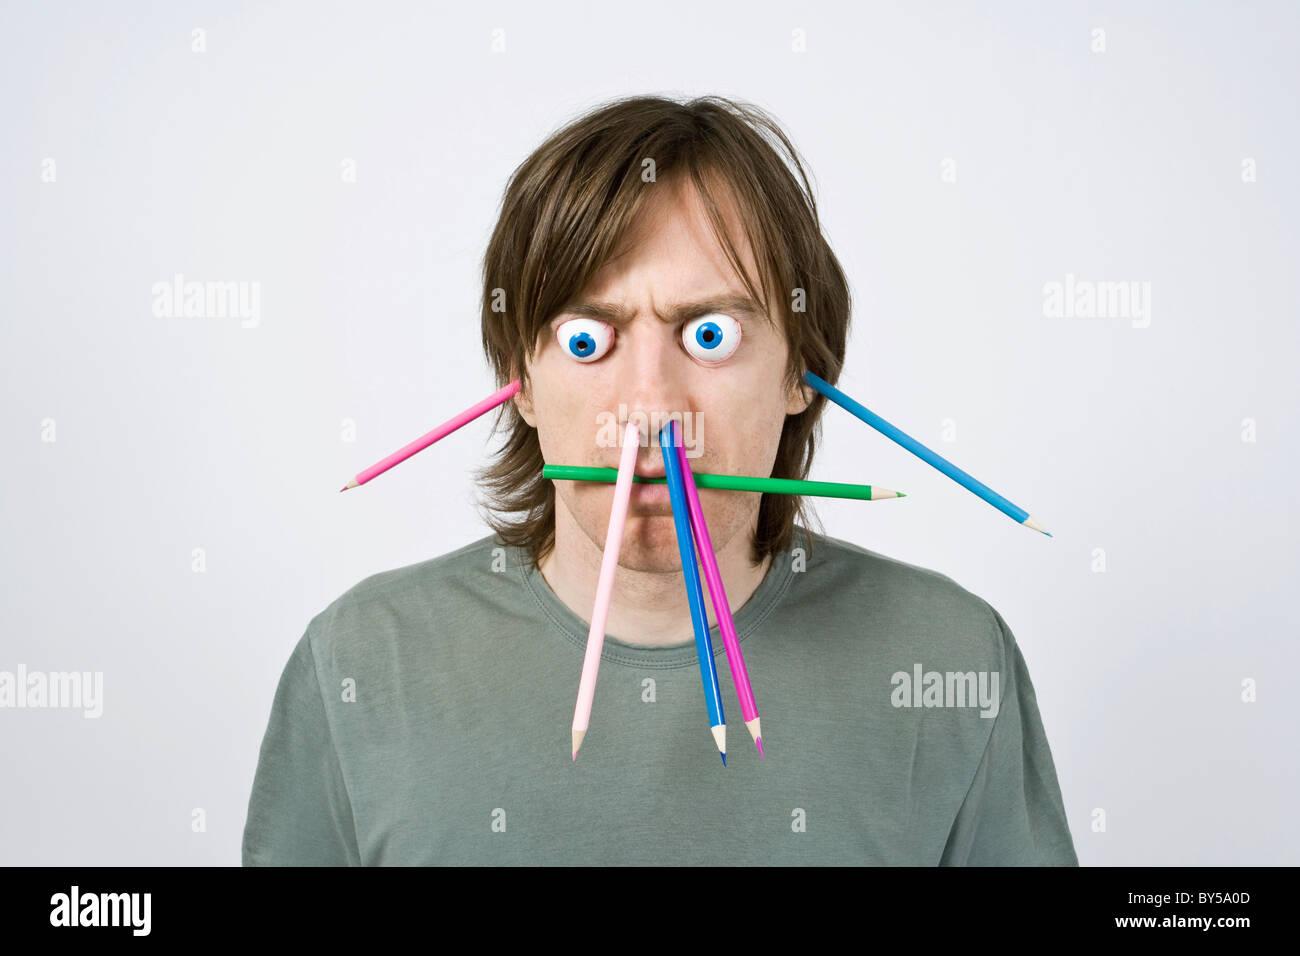 Bizarre man with pencils - Stock Image